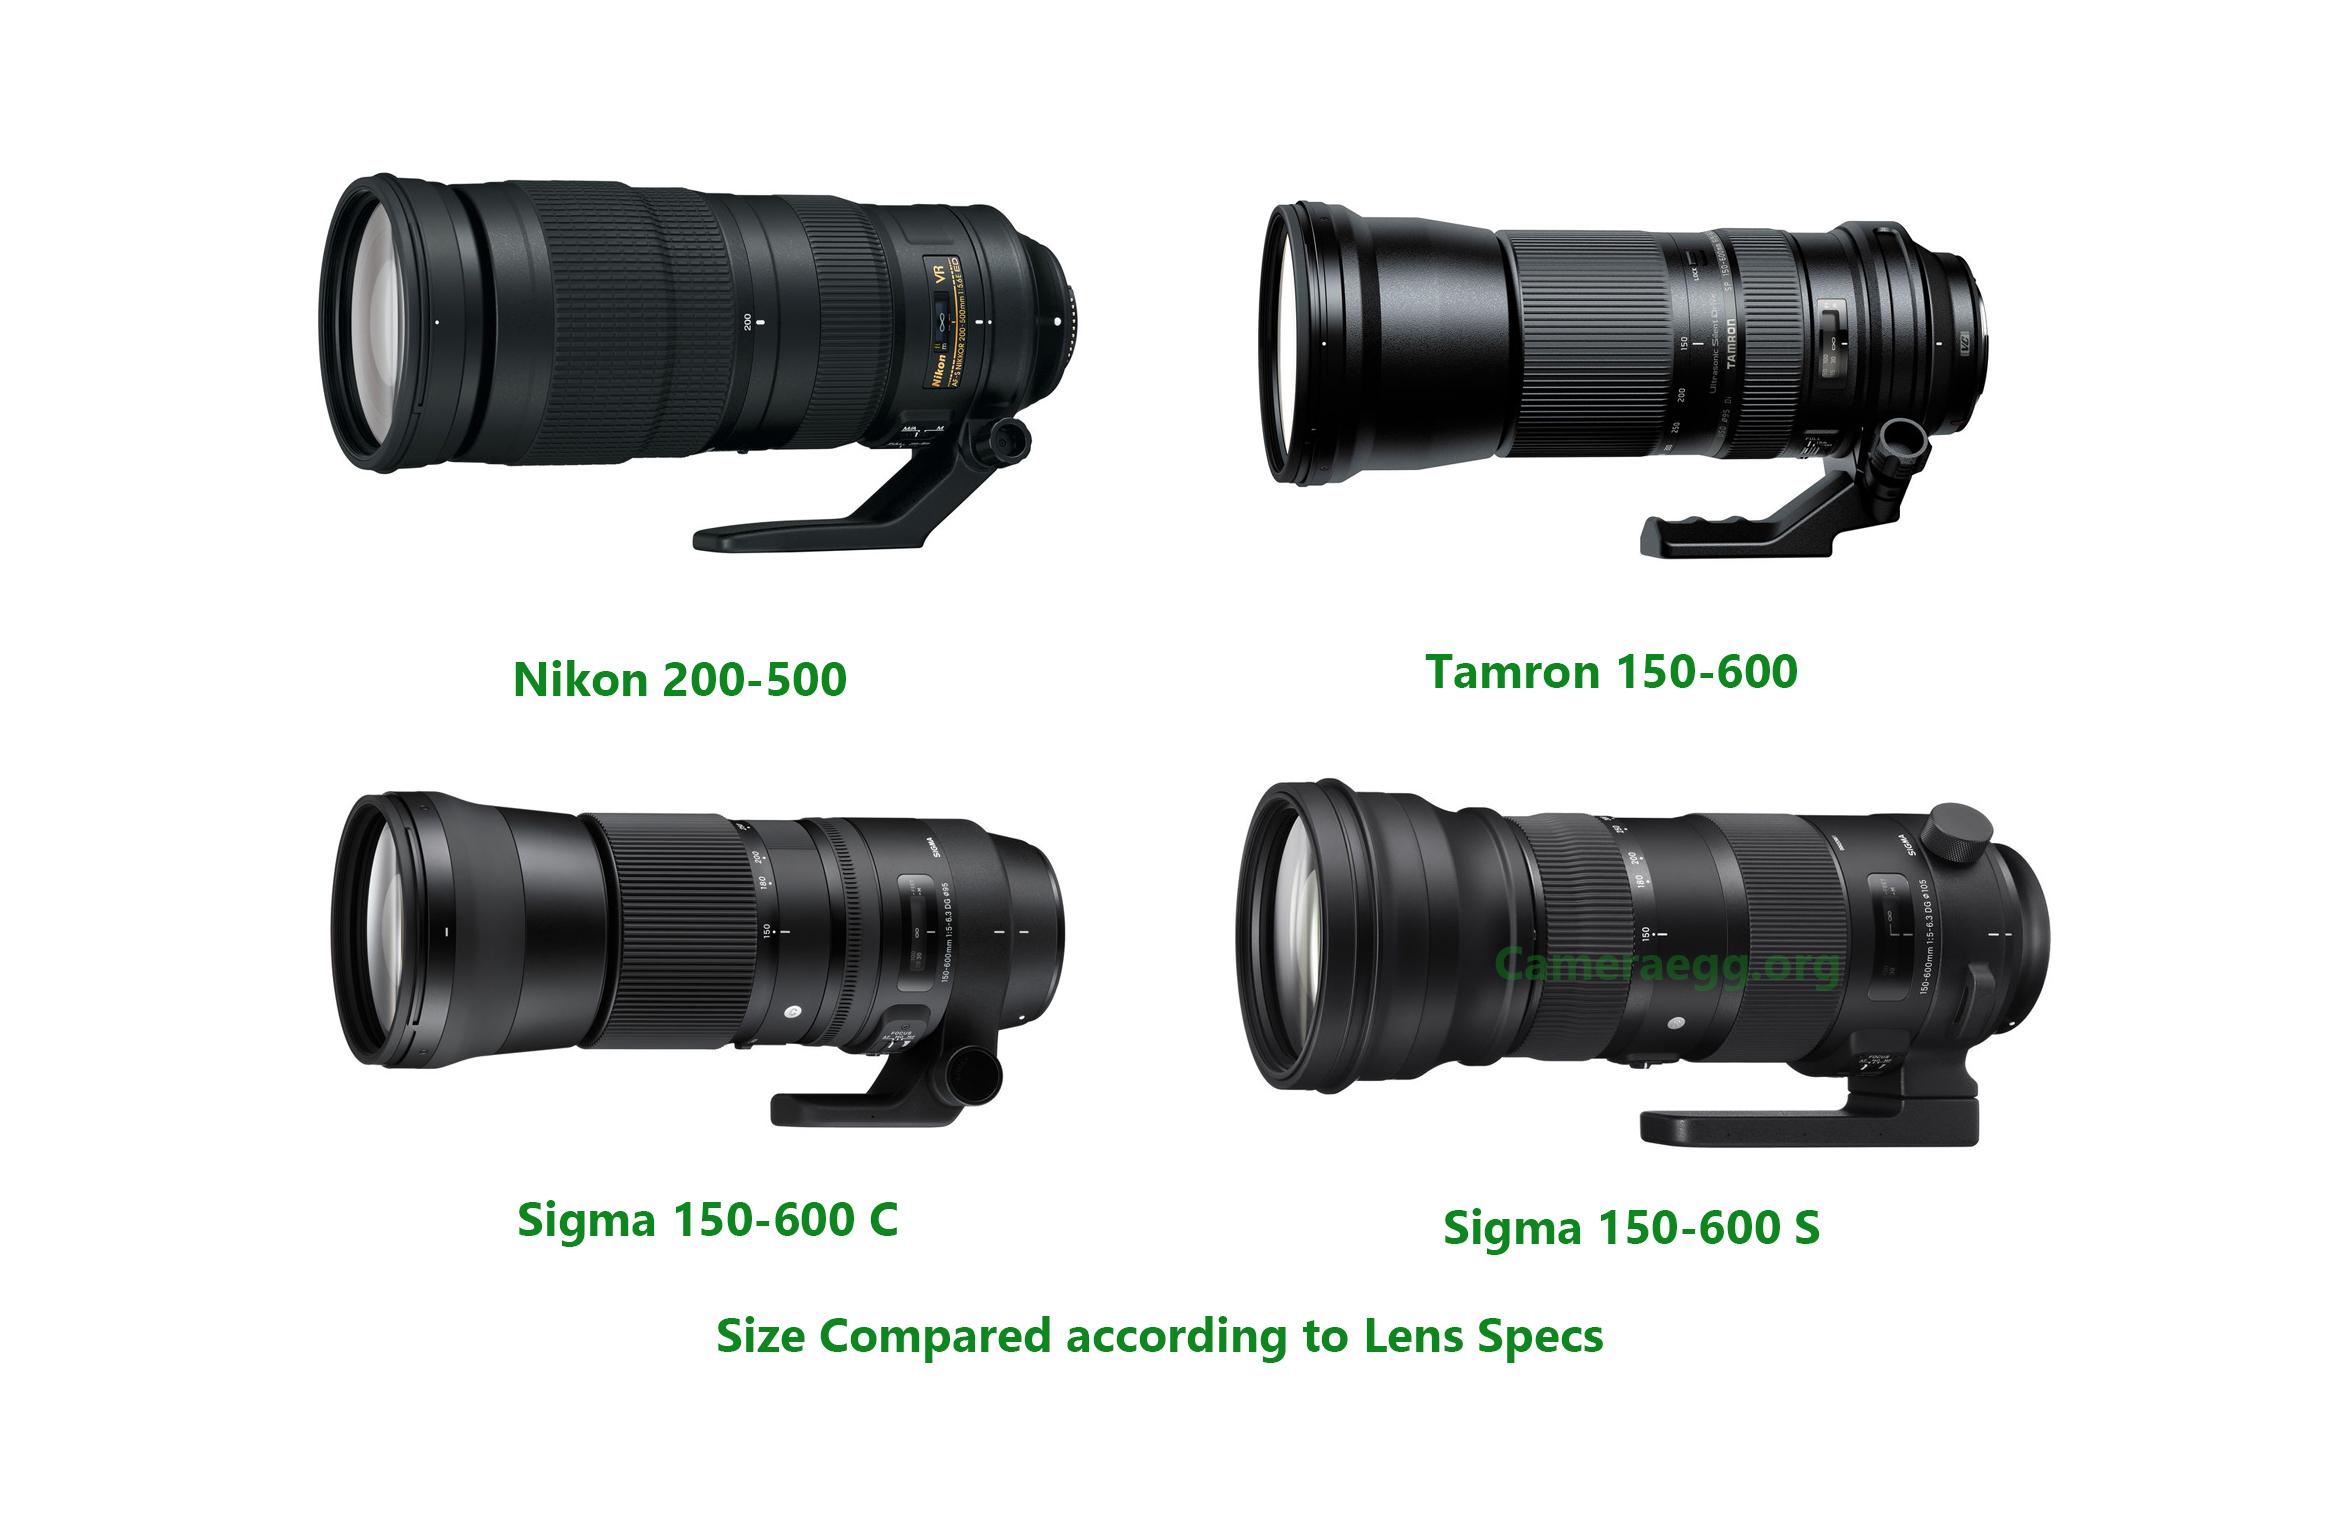 Sigma 150 600mm F 5 63 Dg Os Hsm Sports Lens Camera News At Cameraegg Tamron Sp Di Vc Usd G2 For Canon Ef Nikon 200 500mm Vs C S Specs Size Comparison